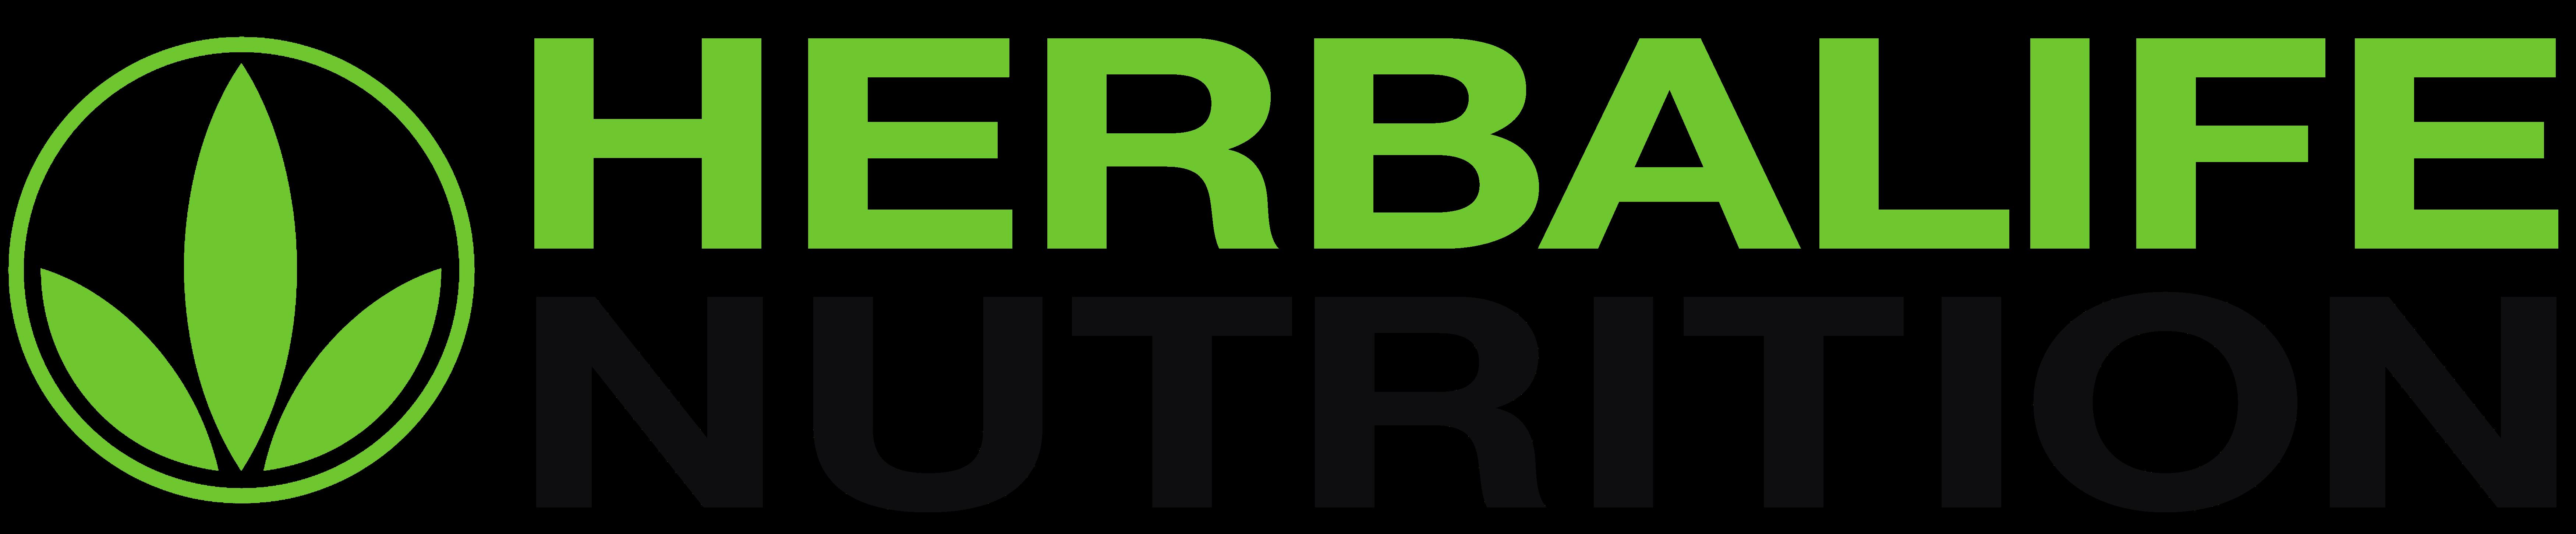 Que Es Herbalife Nutrition - News and Health - Herbalife Shake Logo